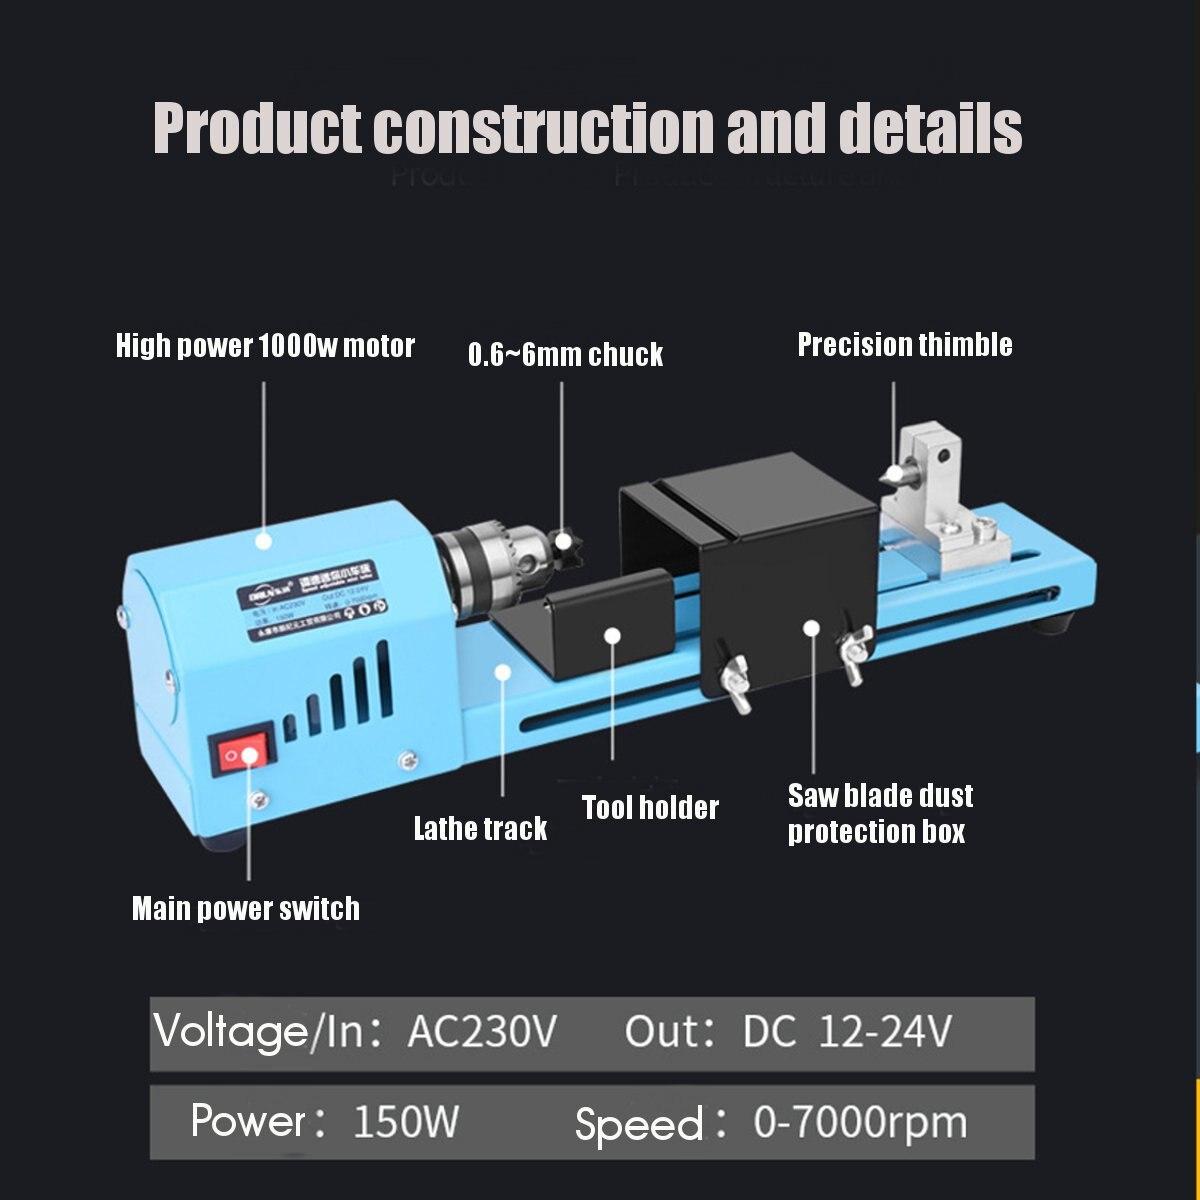 150W Mini Drehmaschine Werkzeug DIY Holzbearbeitung Holz drehmaschine Fräsen maschine Schleifen Polieren Perlen Bohrer Dreh Werkzeug